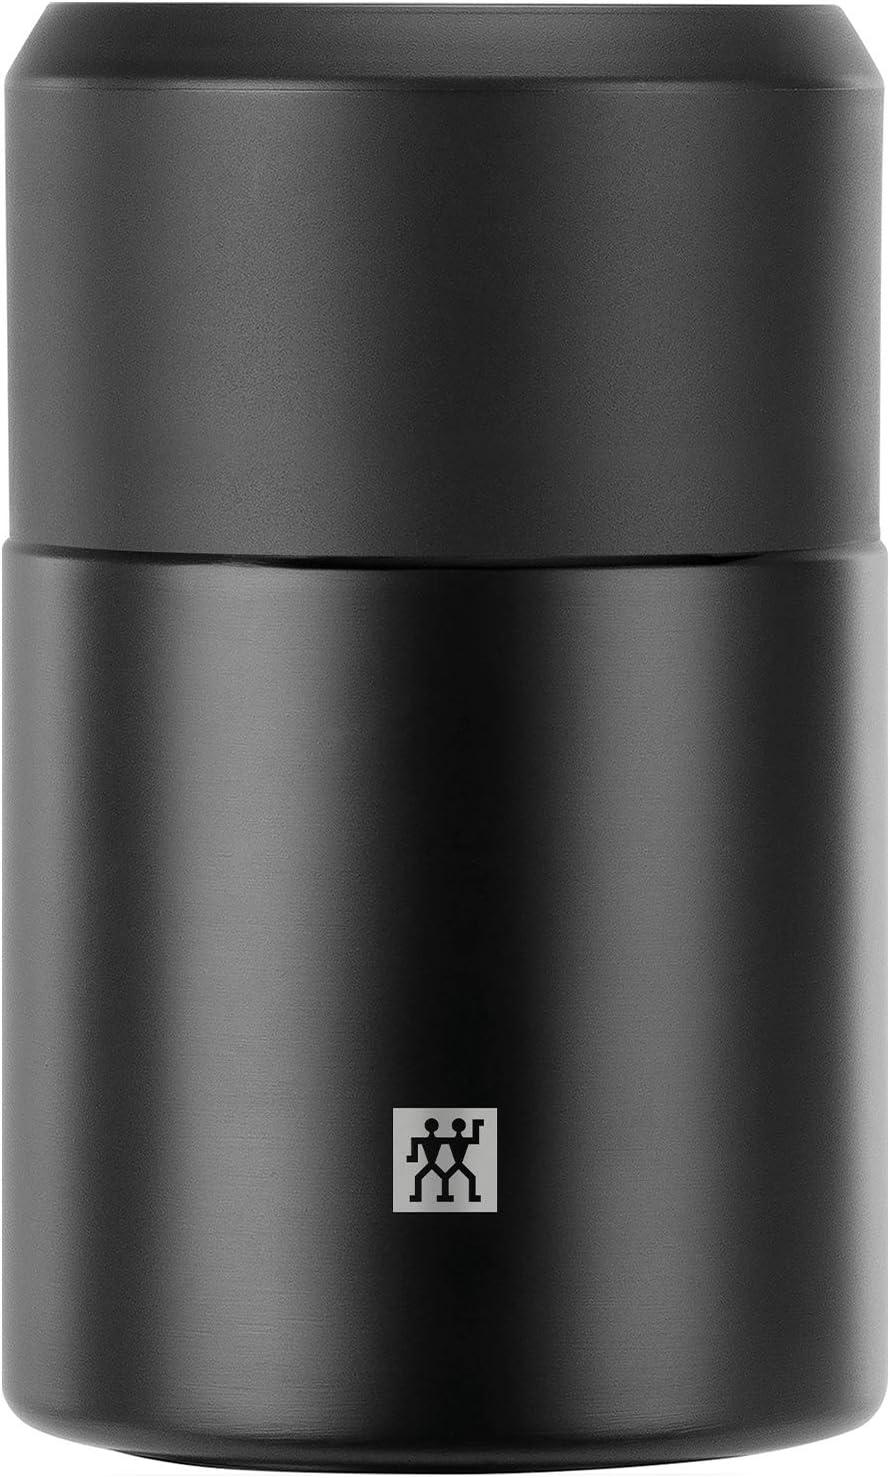 Zwilling 39500-510 - Termo para solidos 700 ml negro